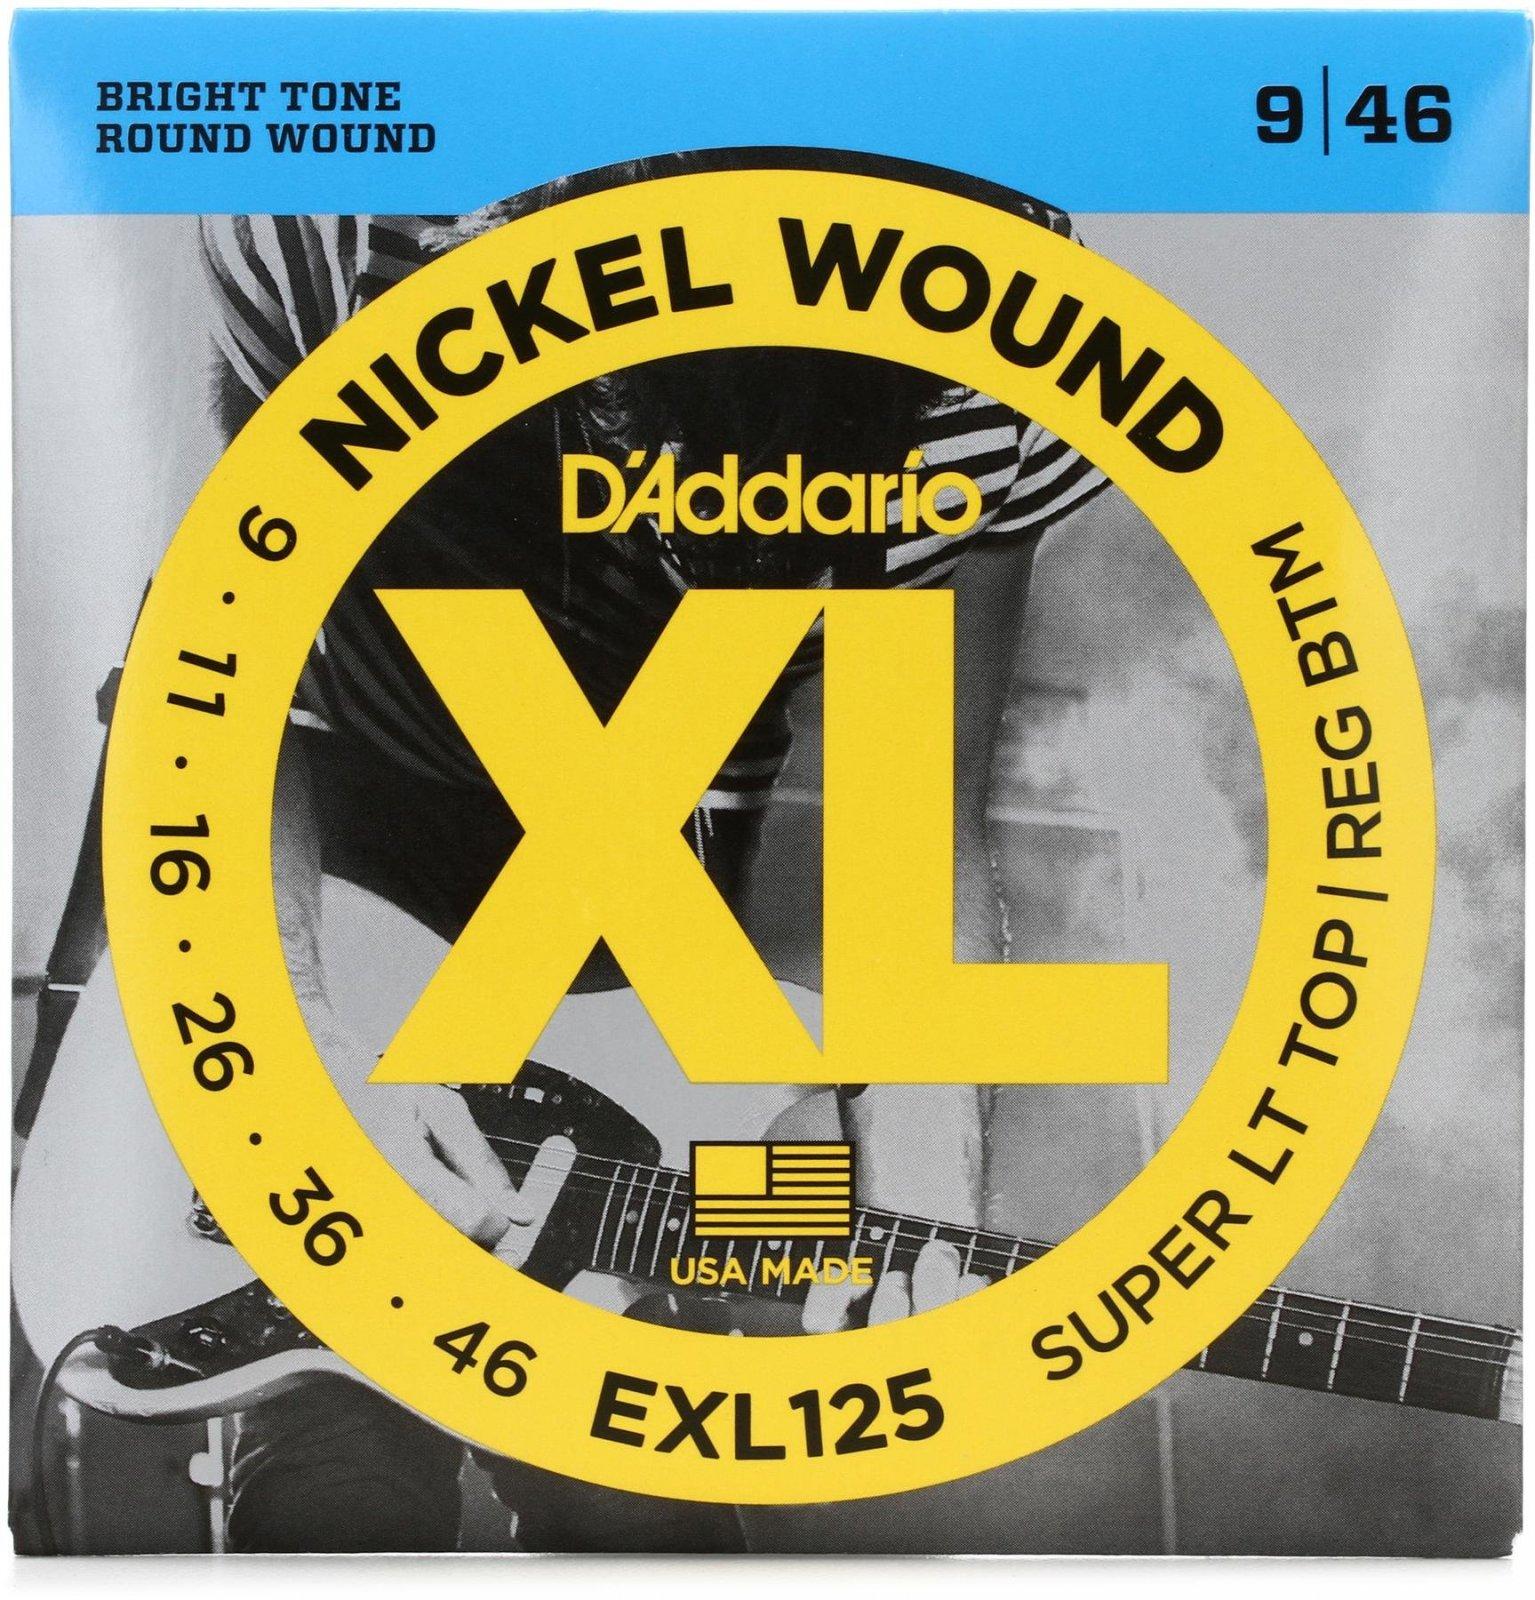 D'addario Super LT Top/Reg BTM Nickel Wound Electric Guitar Strings